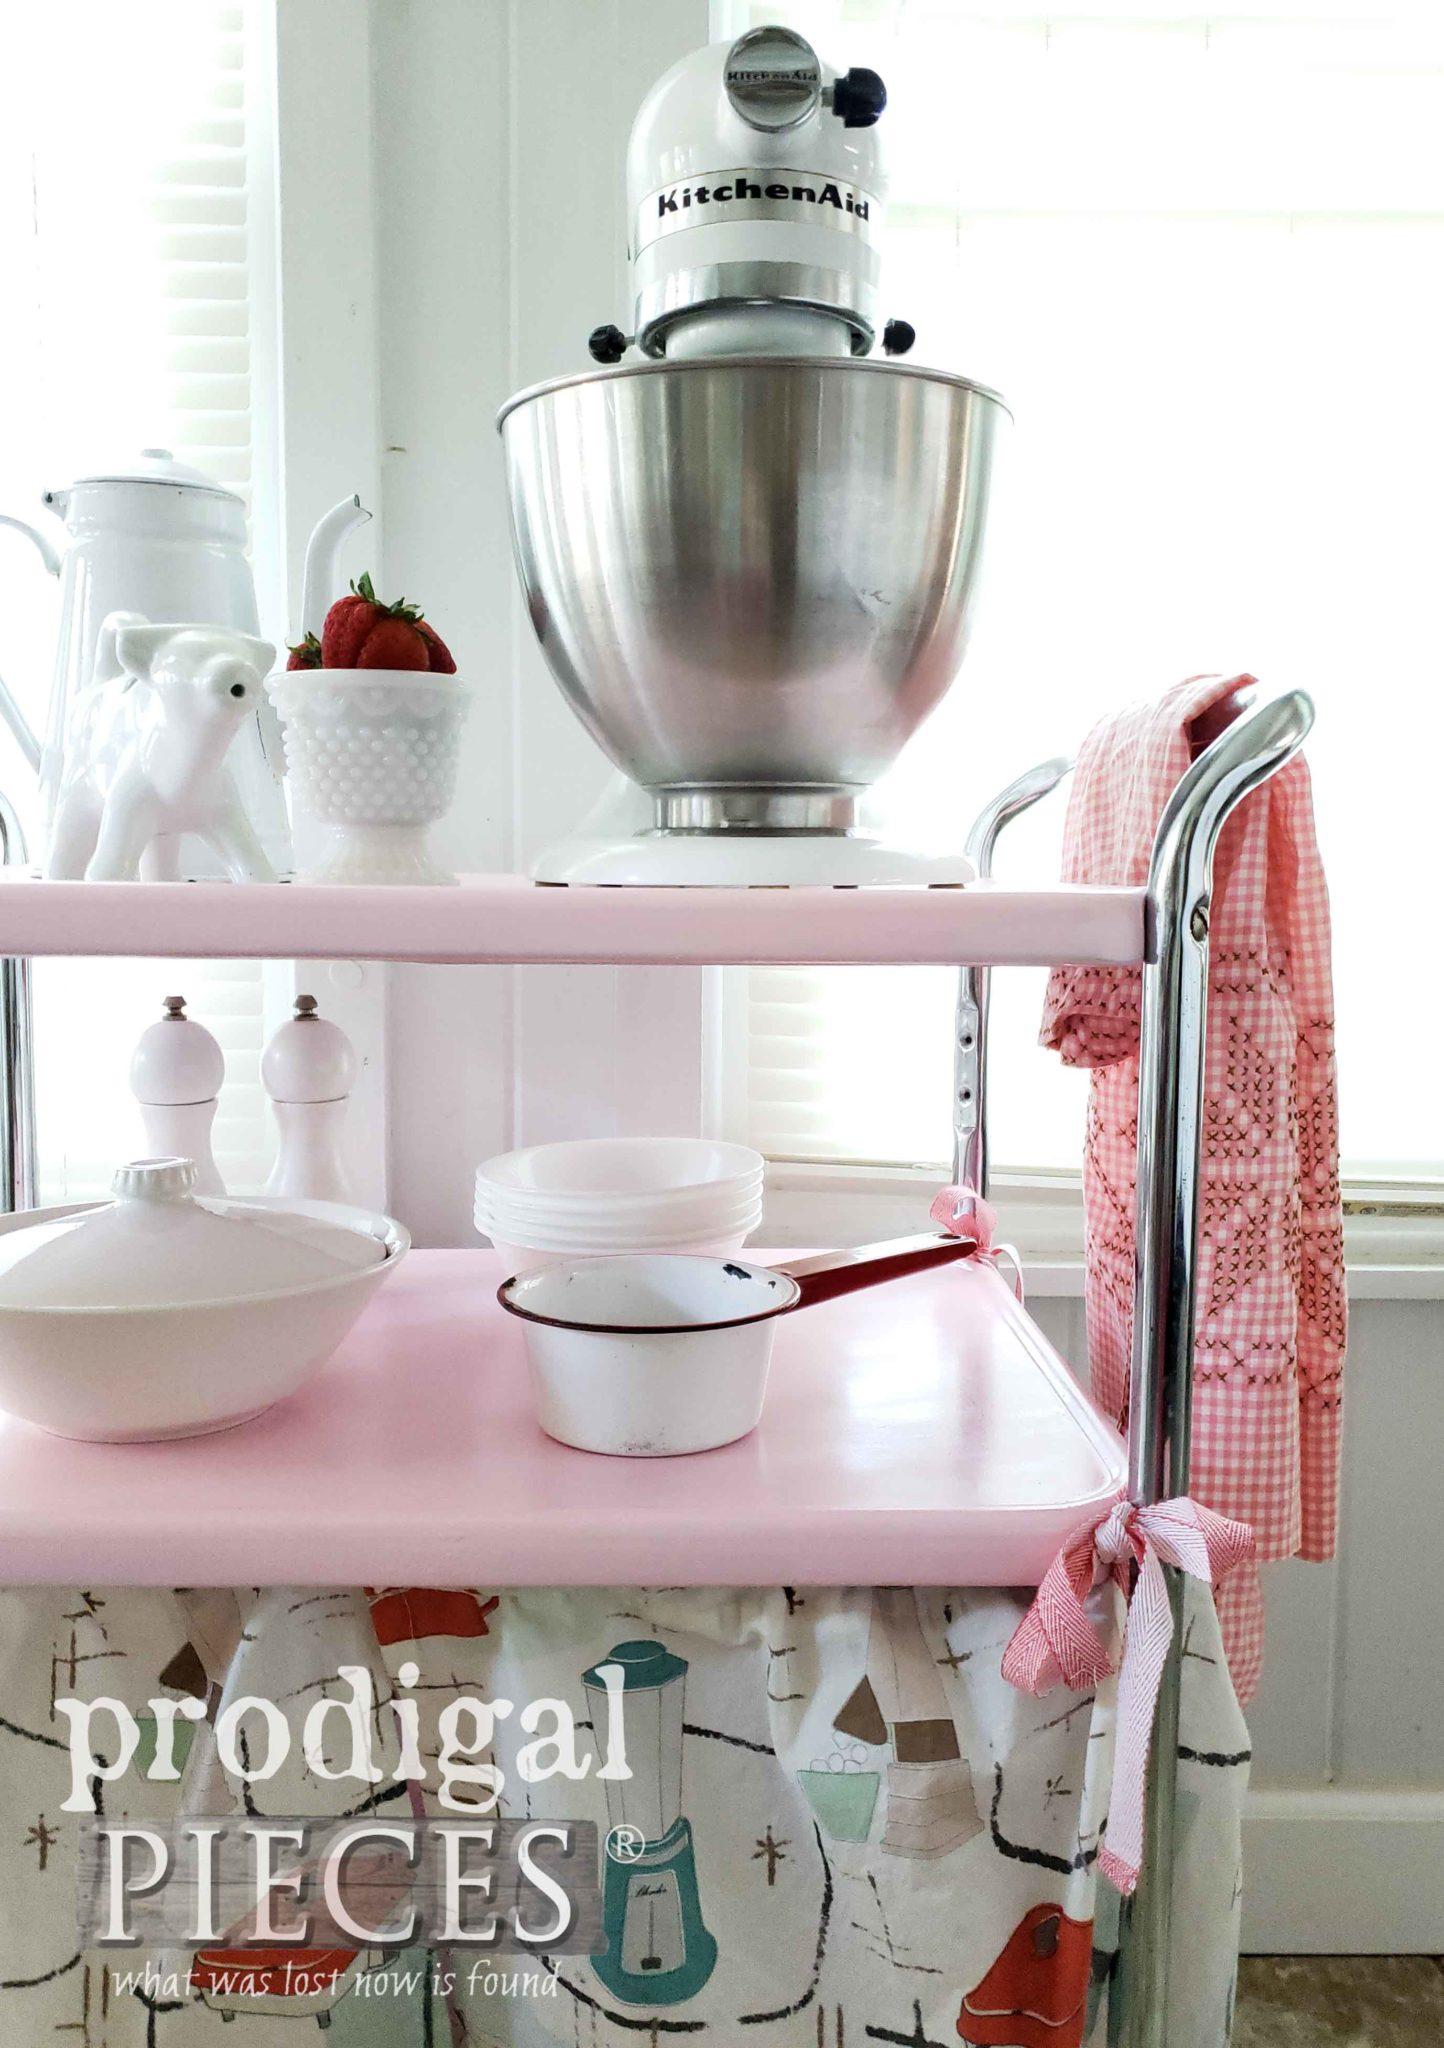 Retro Pink Cosco Kitchen Cart by Larissa of Prodigal Pieces | prodigalpieces.com #prodigalpieces #vintage #pink #home #homedecor